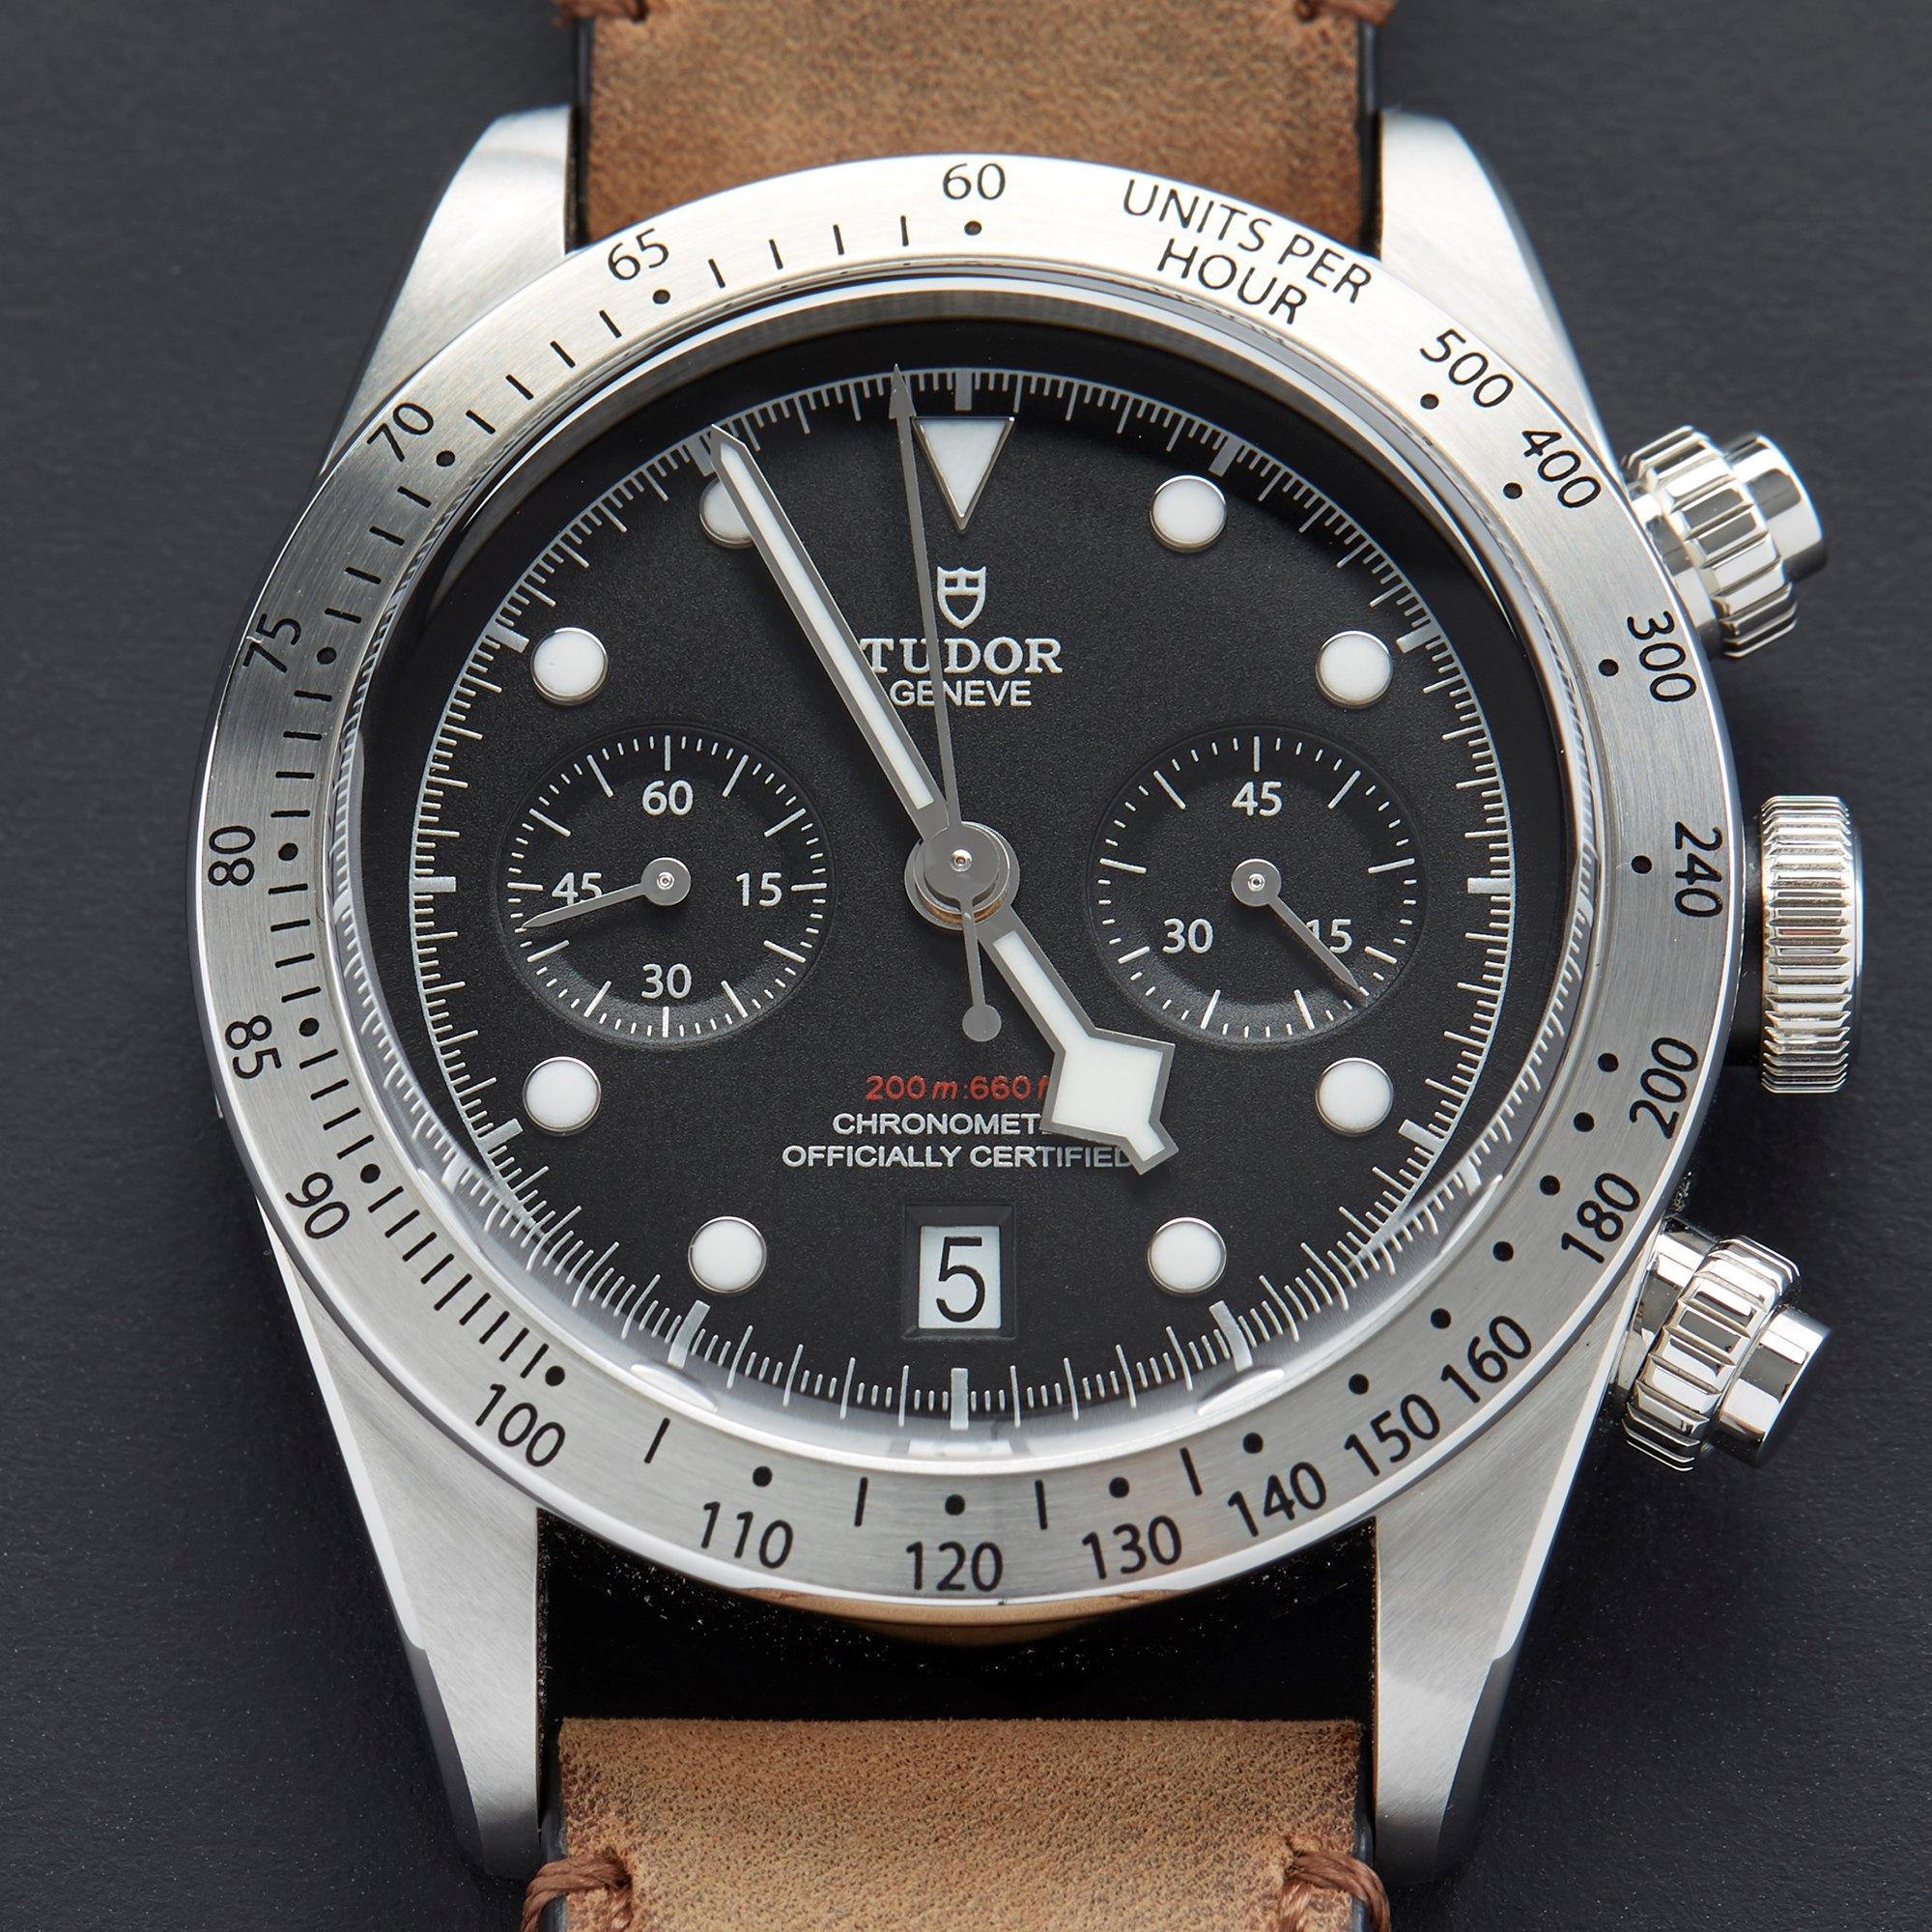 Tudor Black Bay Chronograaf Roestvrij Staal 79350